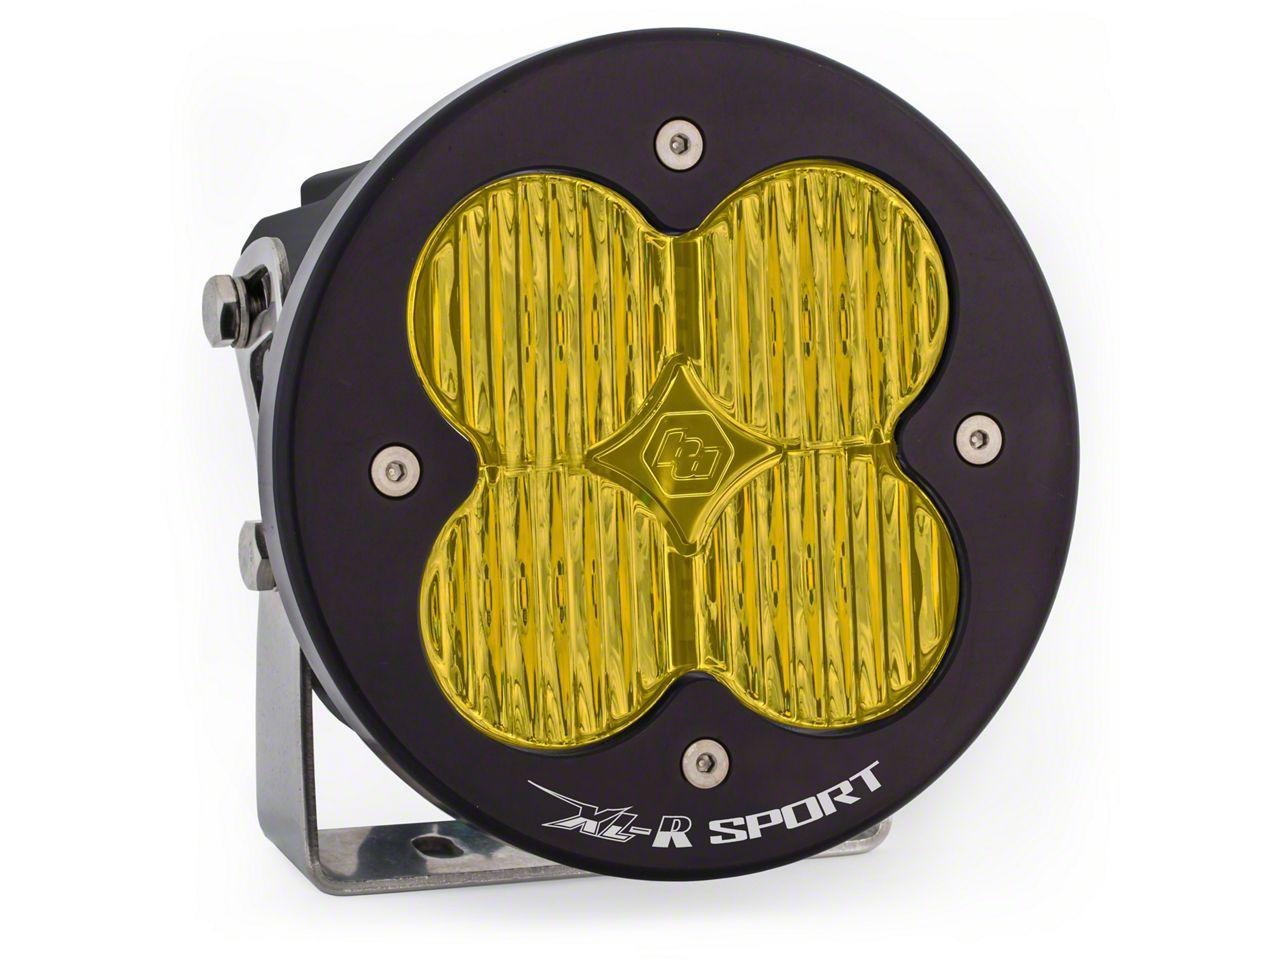 Baja Designs XL-R Sport Amber LED Light - Wide Cornering Beam